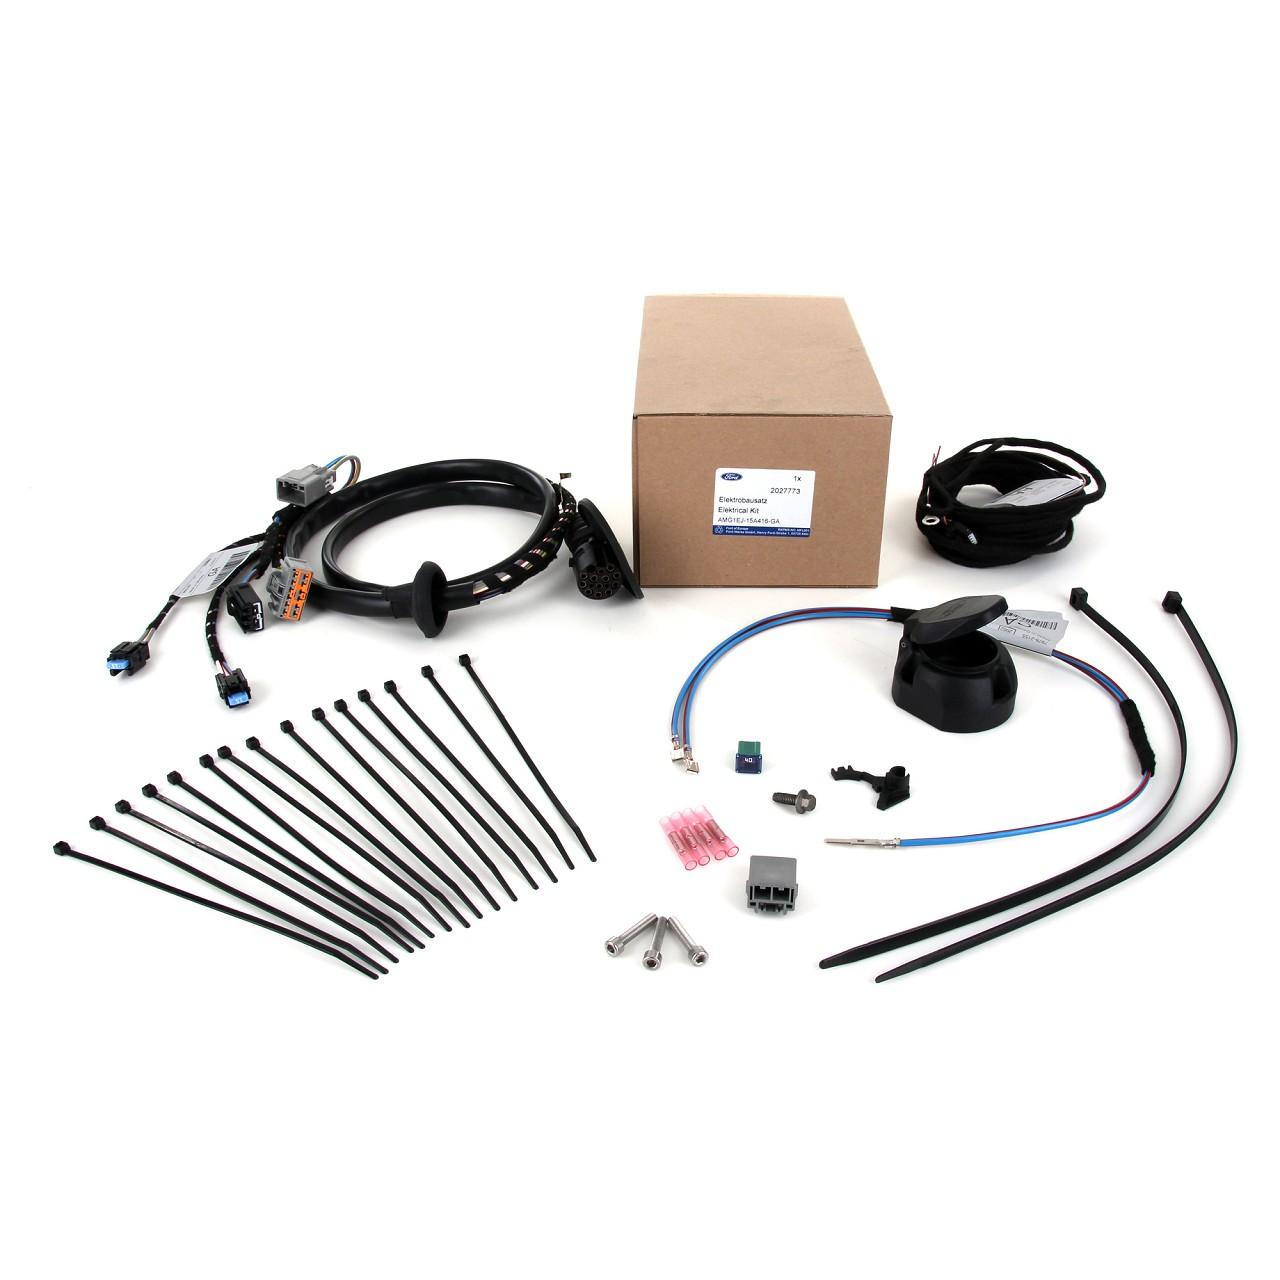 ORIGINAL Ford E-Satz Kabelsatz Anhängerkupplung 13-POL 2027773 FOCUS III Turnier